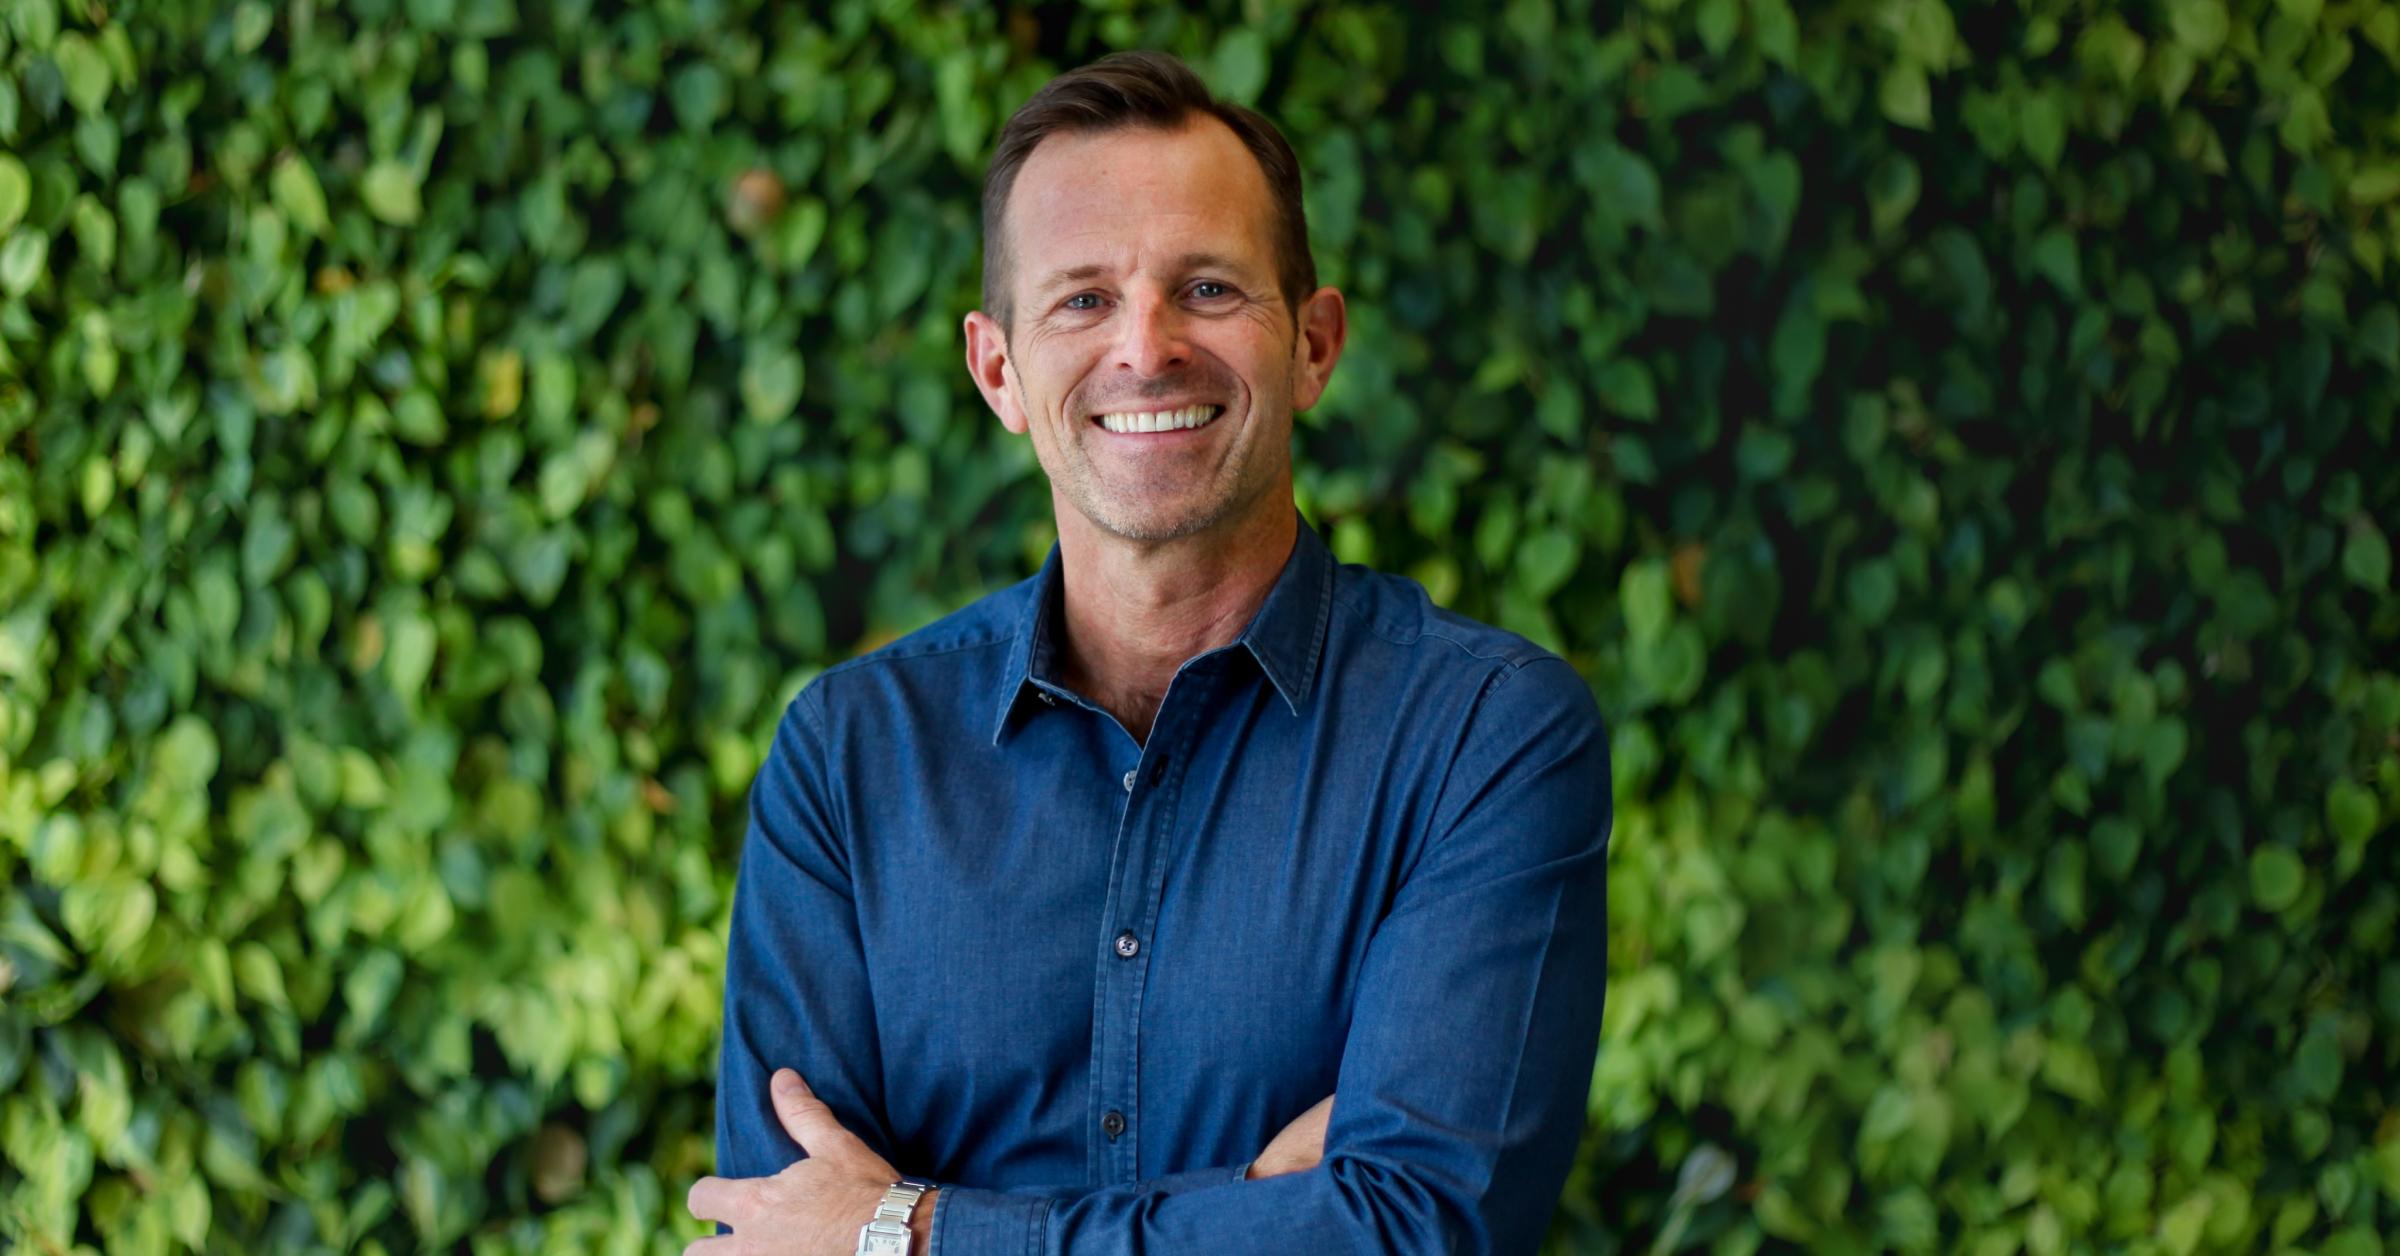 David Dancer, Chief Marketing Officer at Inspire